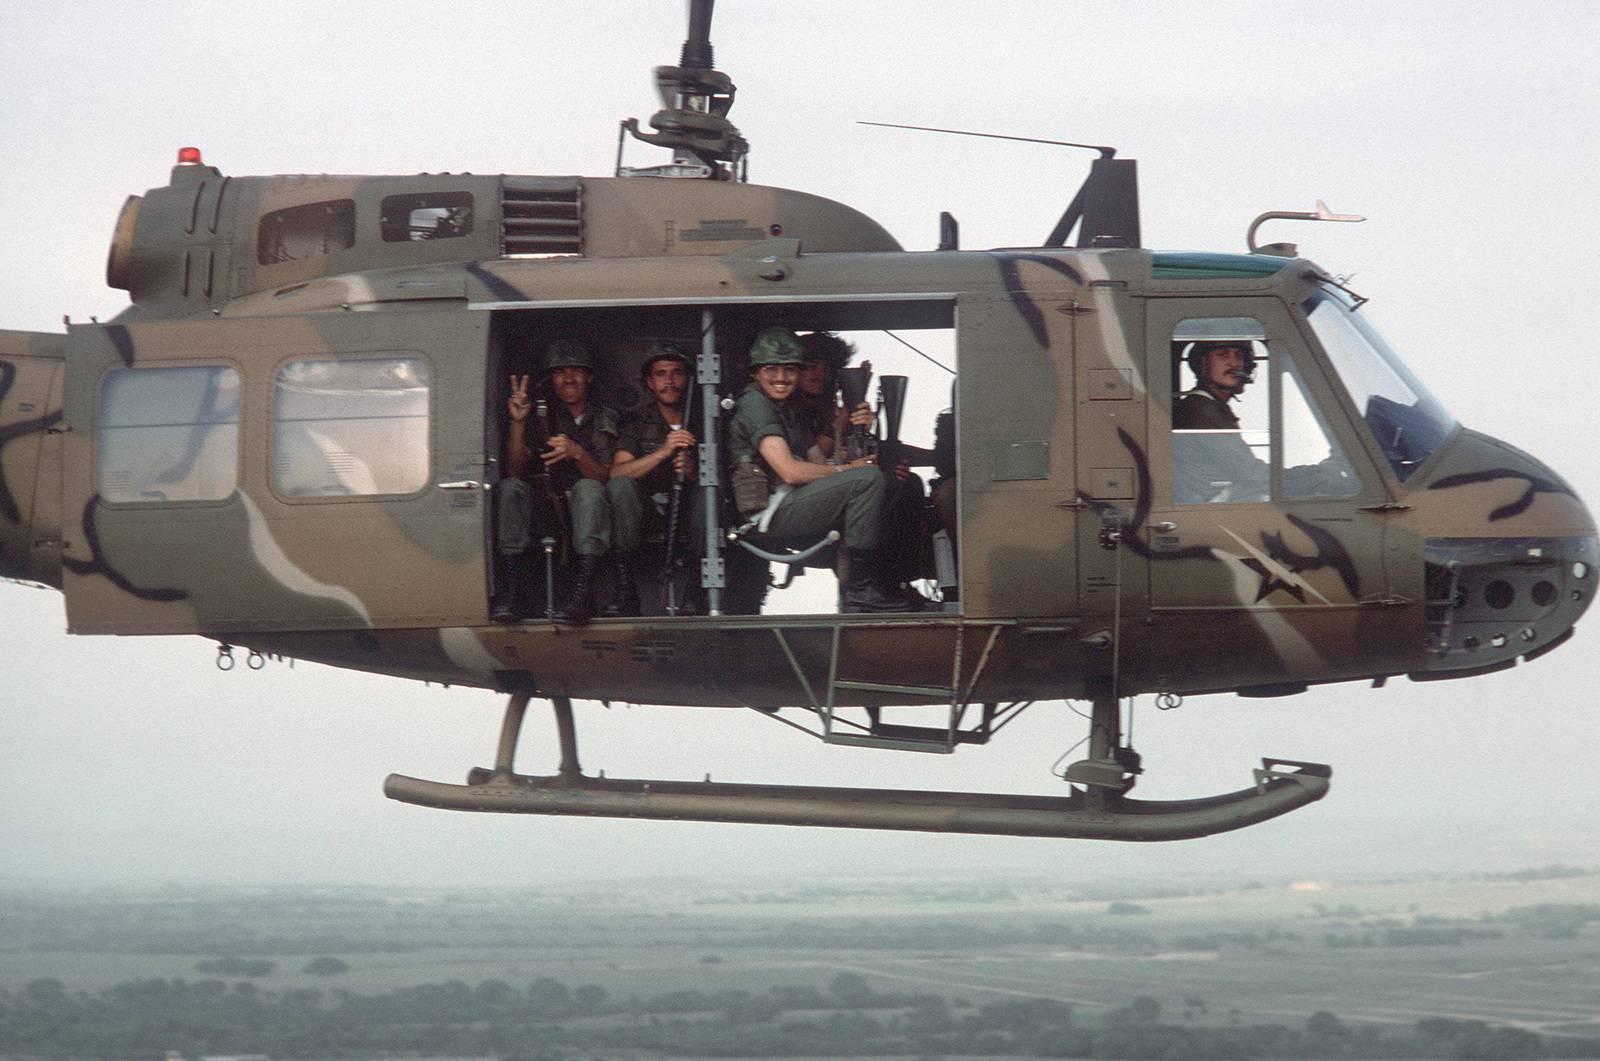 Bell uh-1 iroquois — американская легенда по имени хьюи